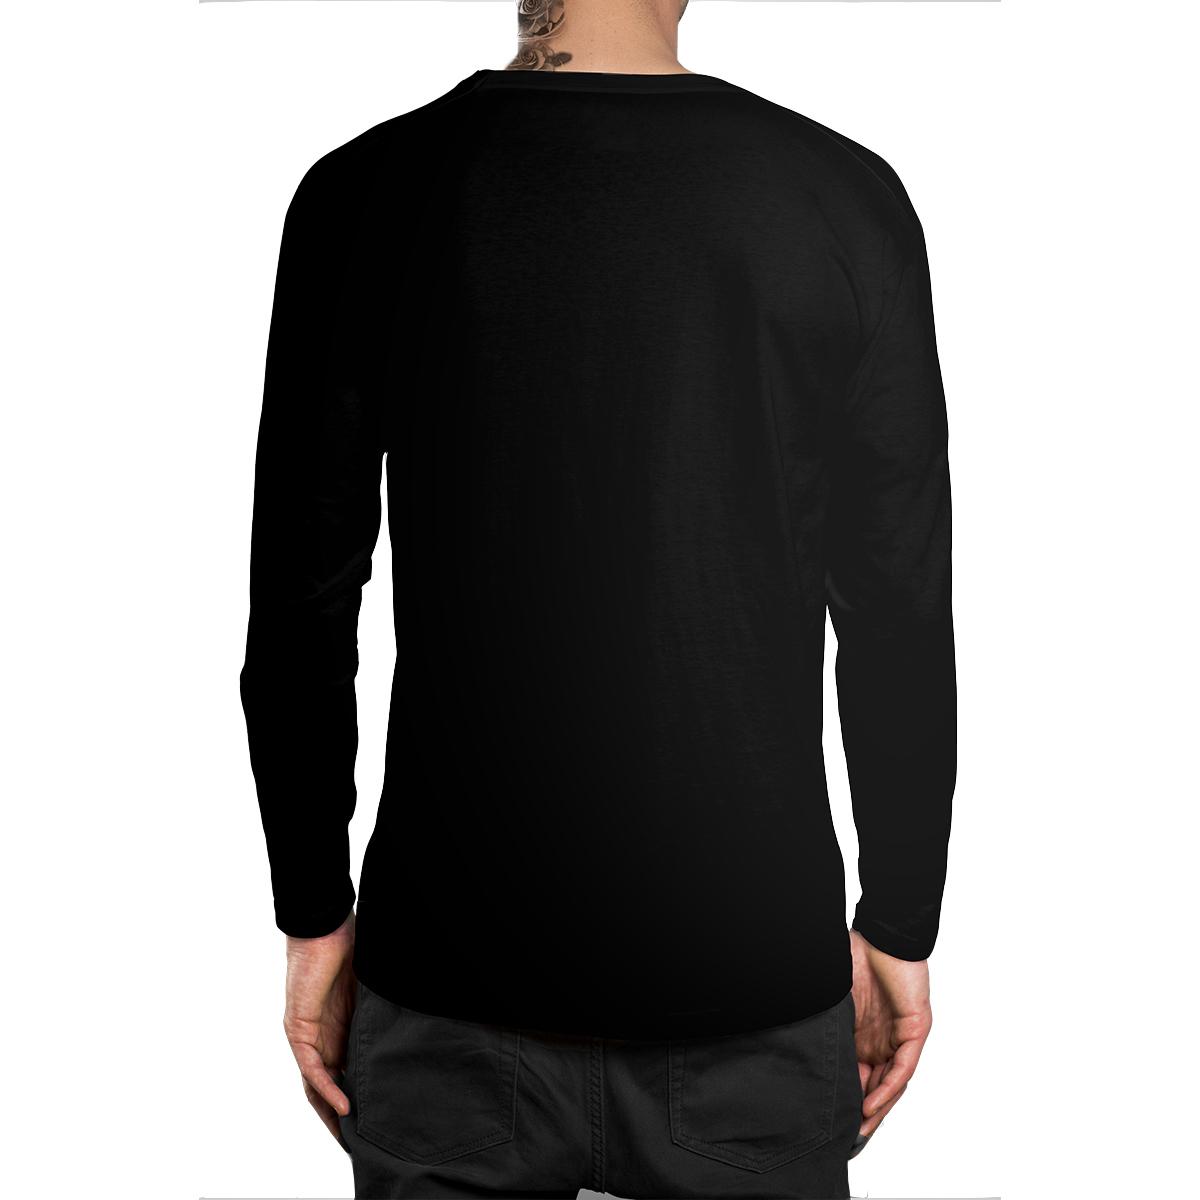 Stompy Camiseta Manga Longa Modelo 01